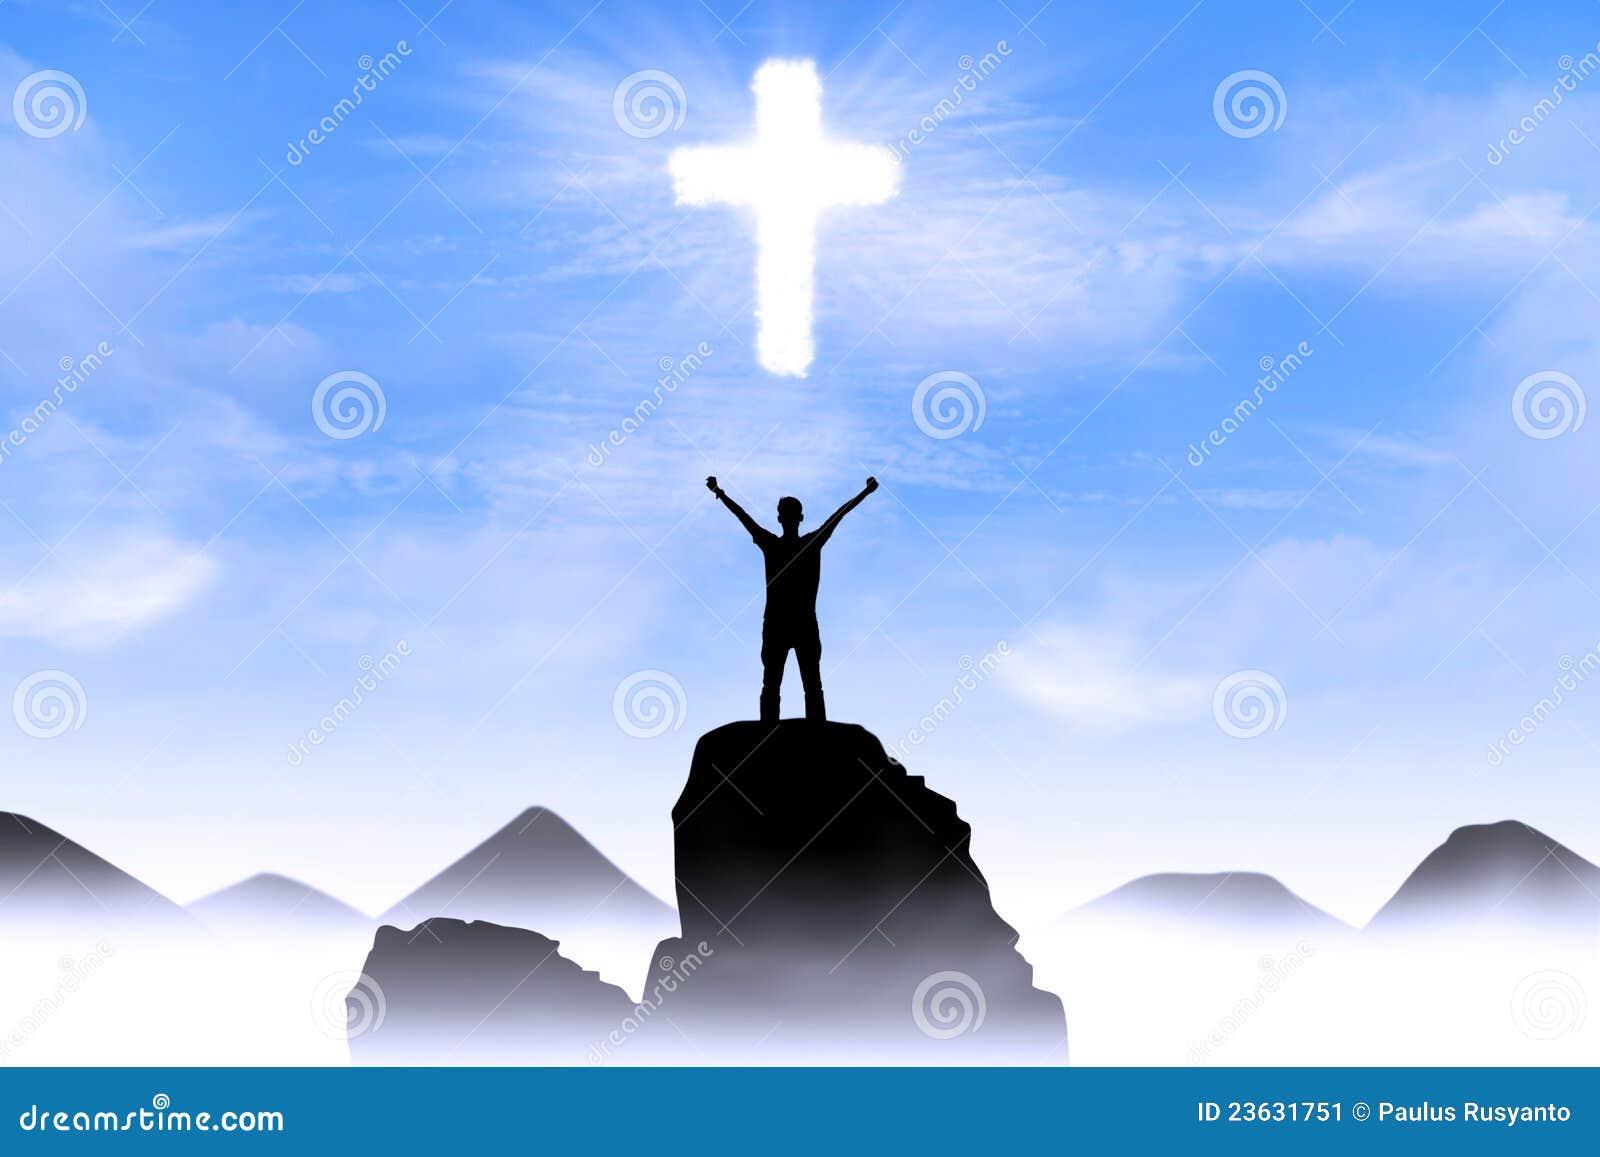 Free Christian Clip Art Thank You